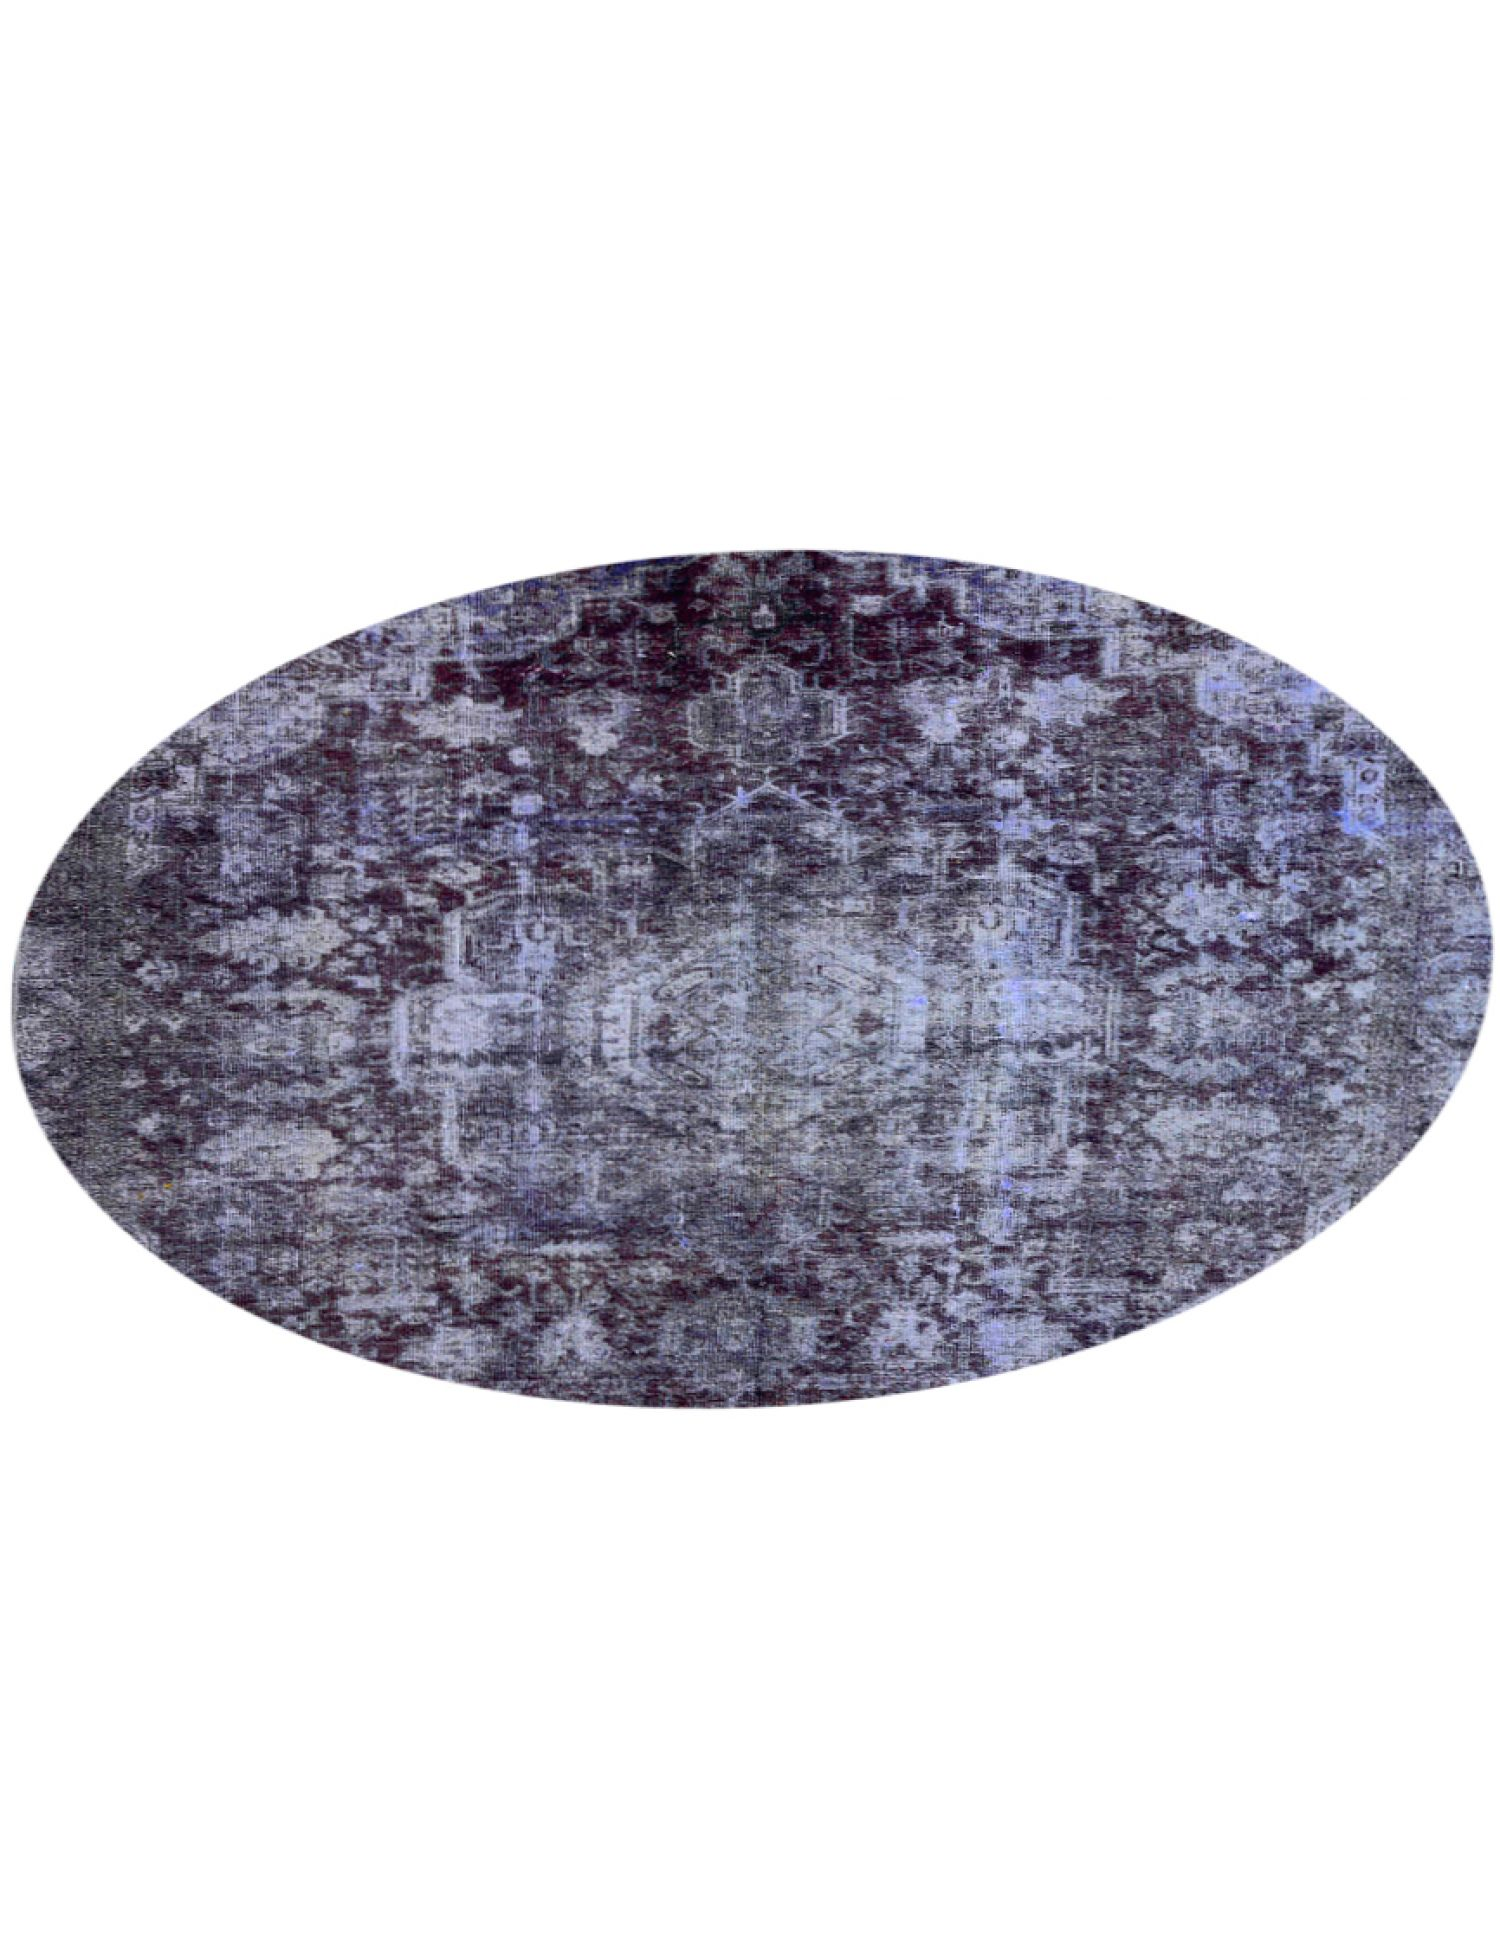 Tappeto Vintage  viola <br/>252 x 252 cm